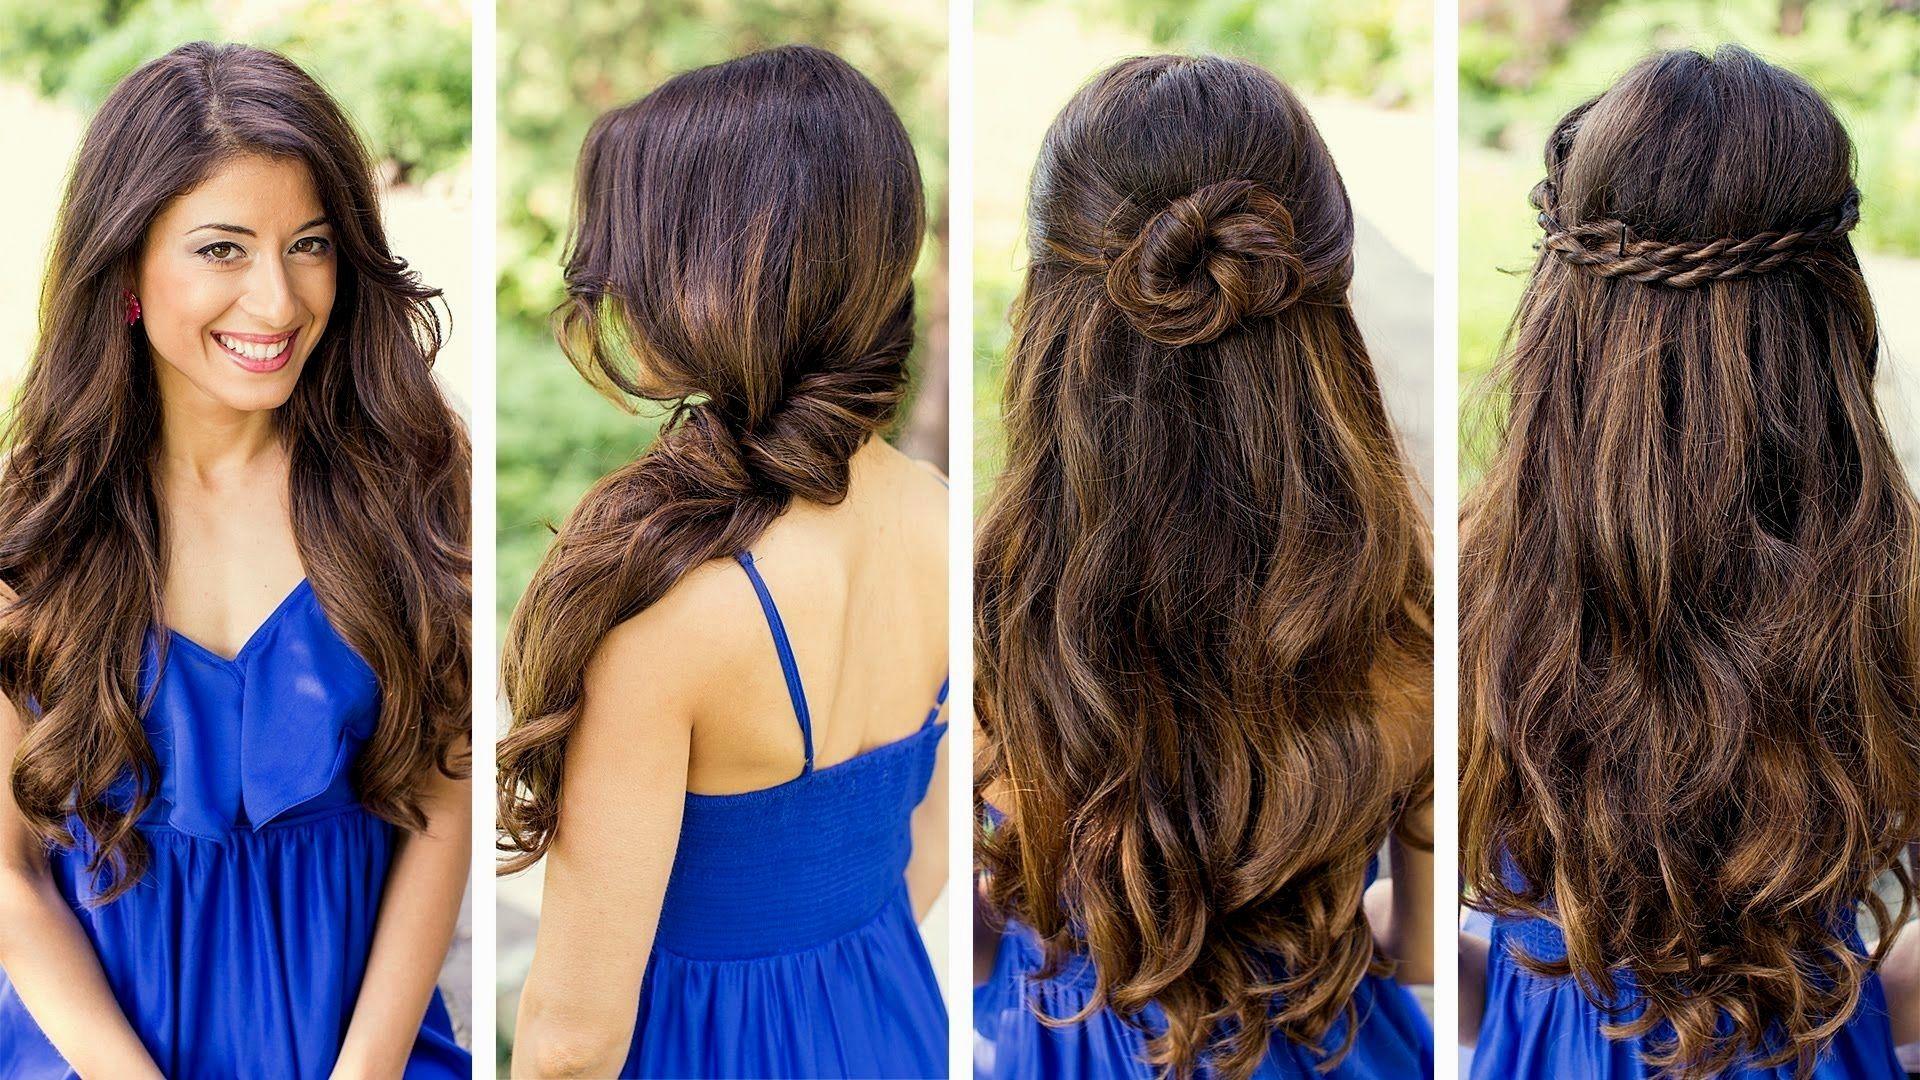 Wwv Hairstylestrends Me Long Hair Indian Girls Cute Hairstyles Long Cute Simple Hairstyles